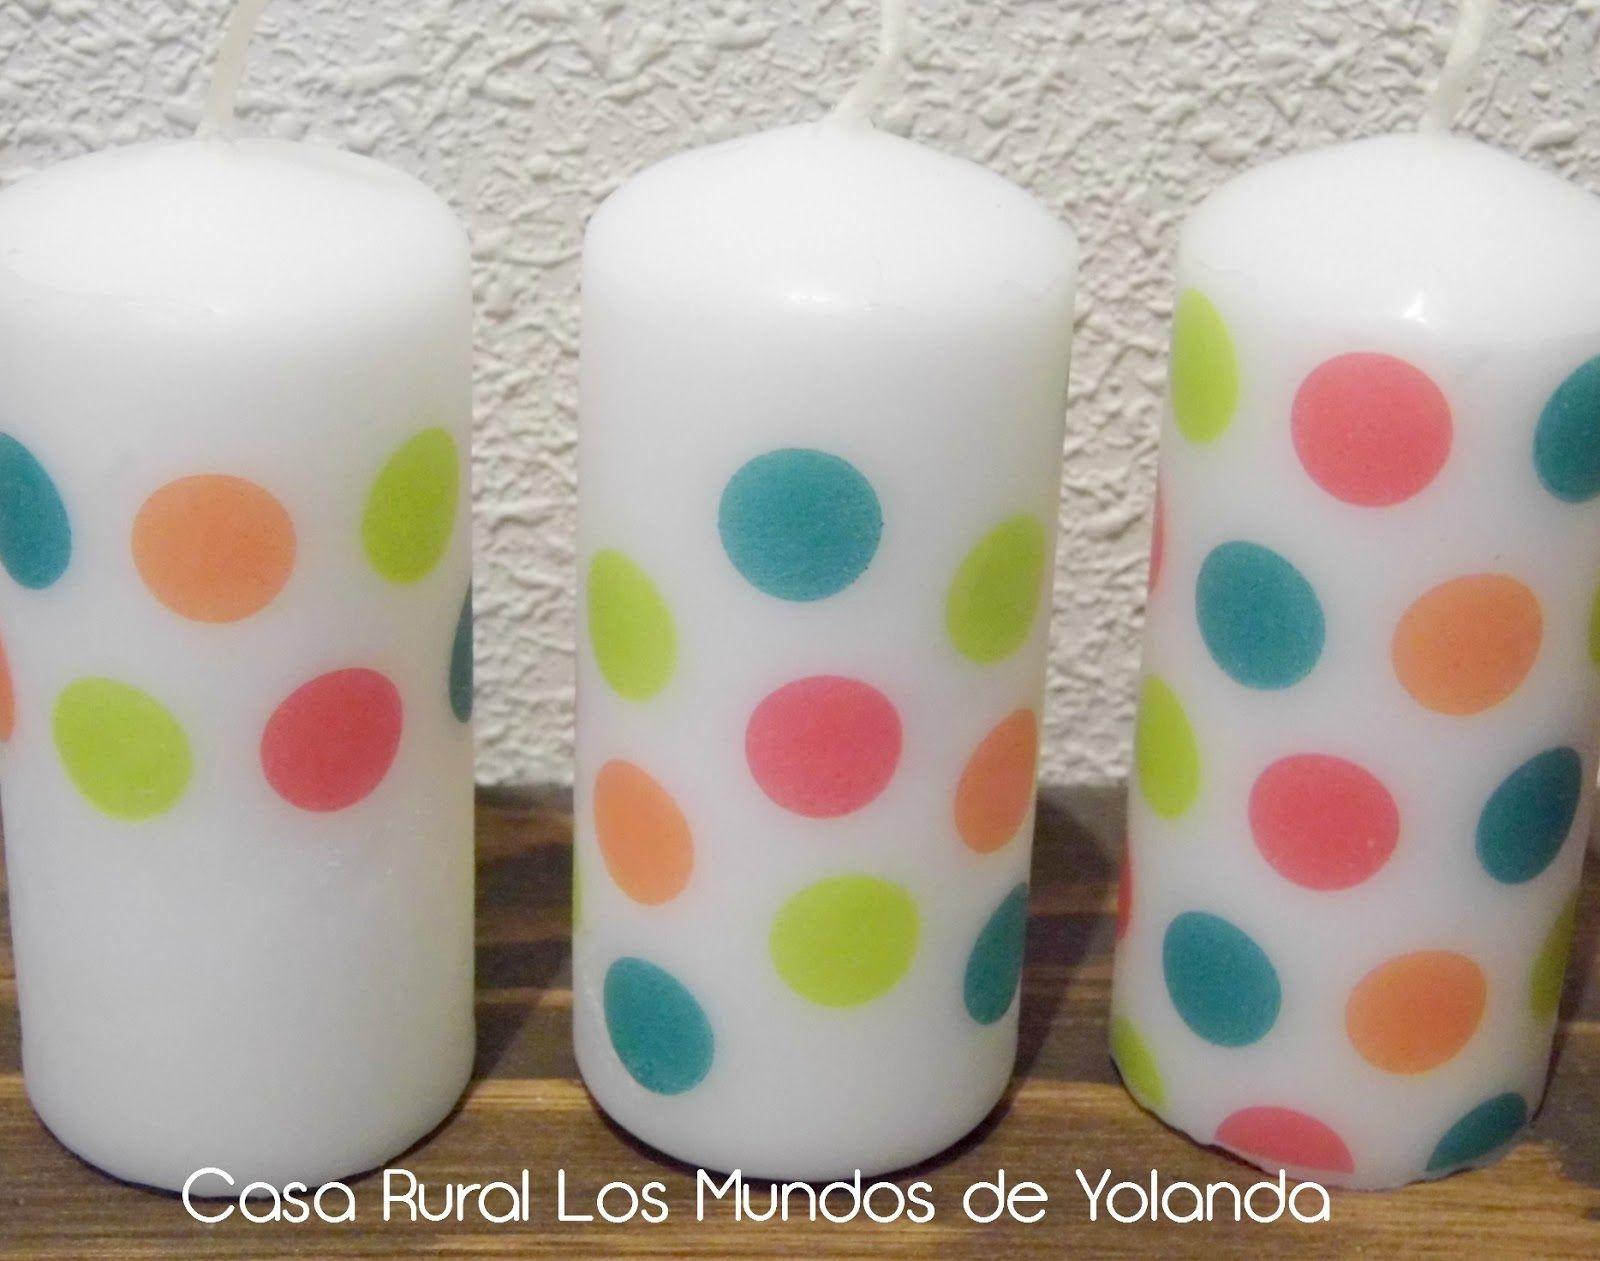 Velas Y Servilletas Decoradas Velas Pinterest Wax Candles Wax - Decorar-velas-con-servilletas